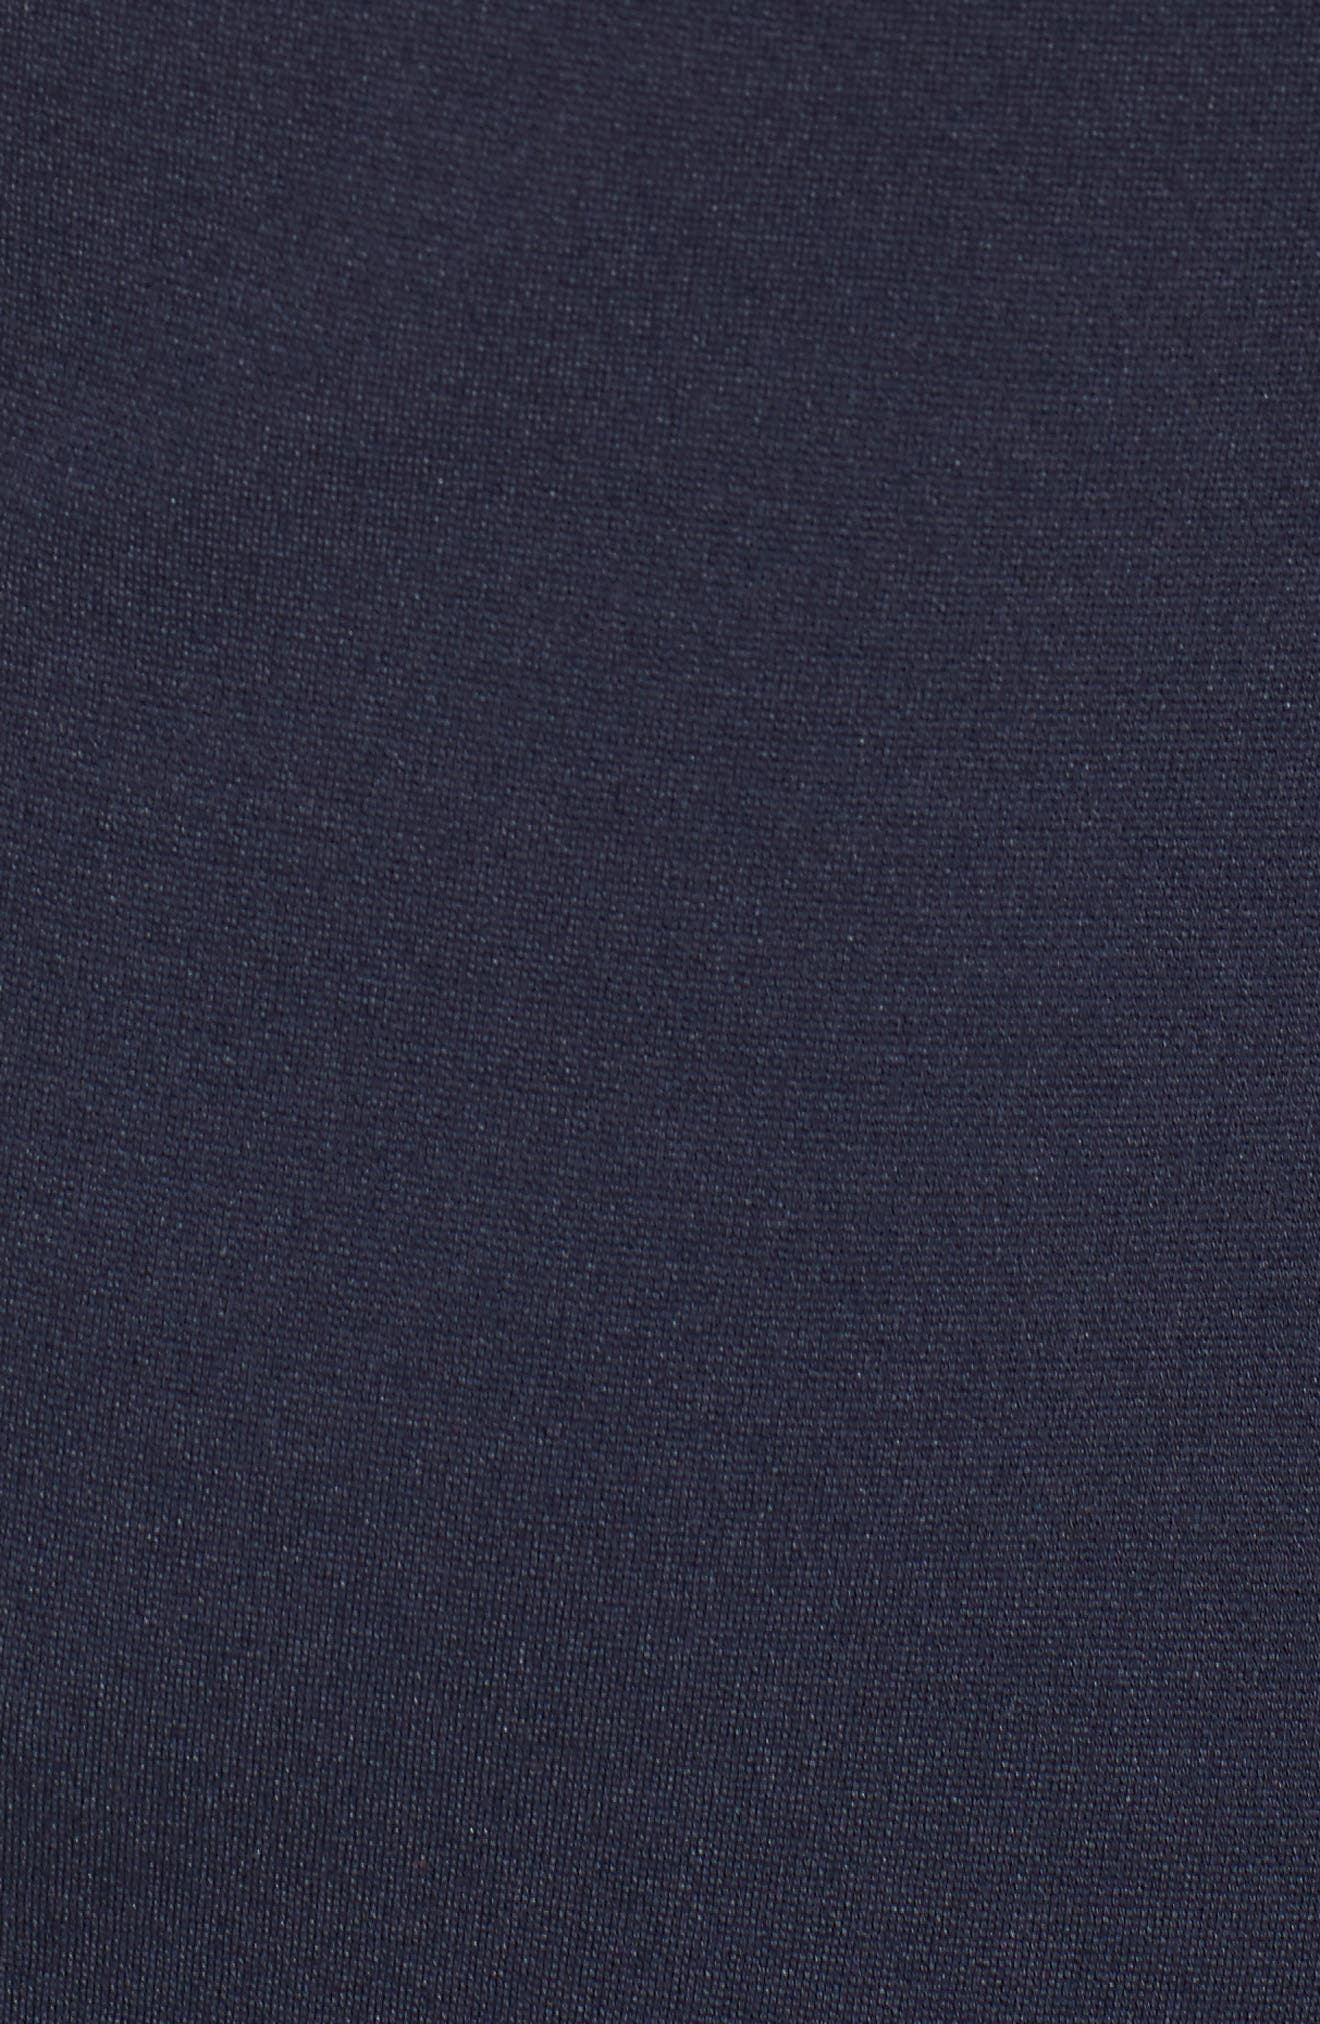 Ruffle Sleeve Sheath Dress,                             Alternate thumbnail 6, color,                             Navy